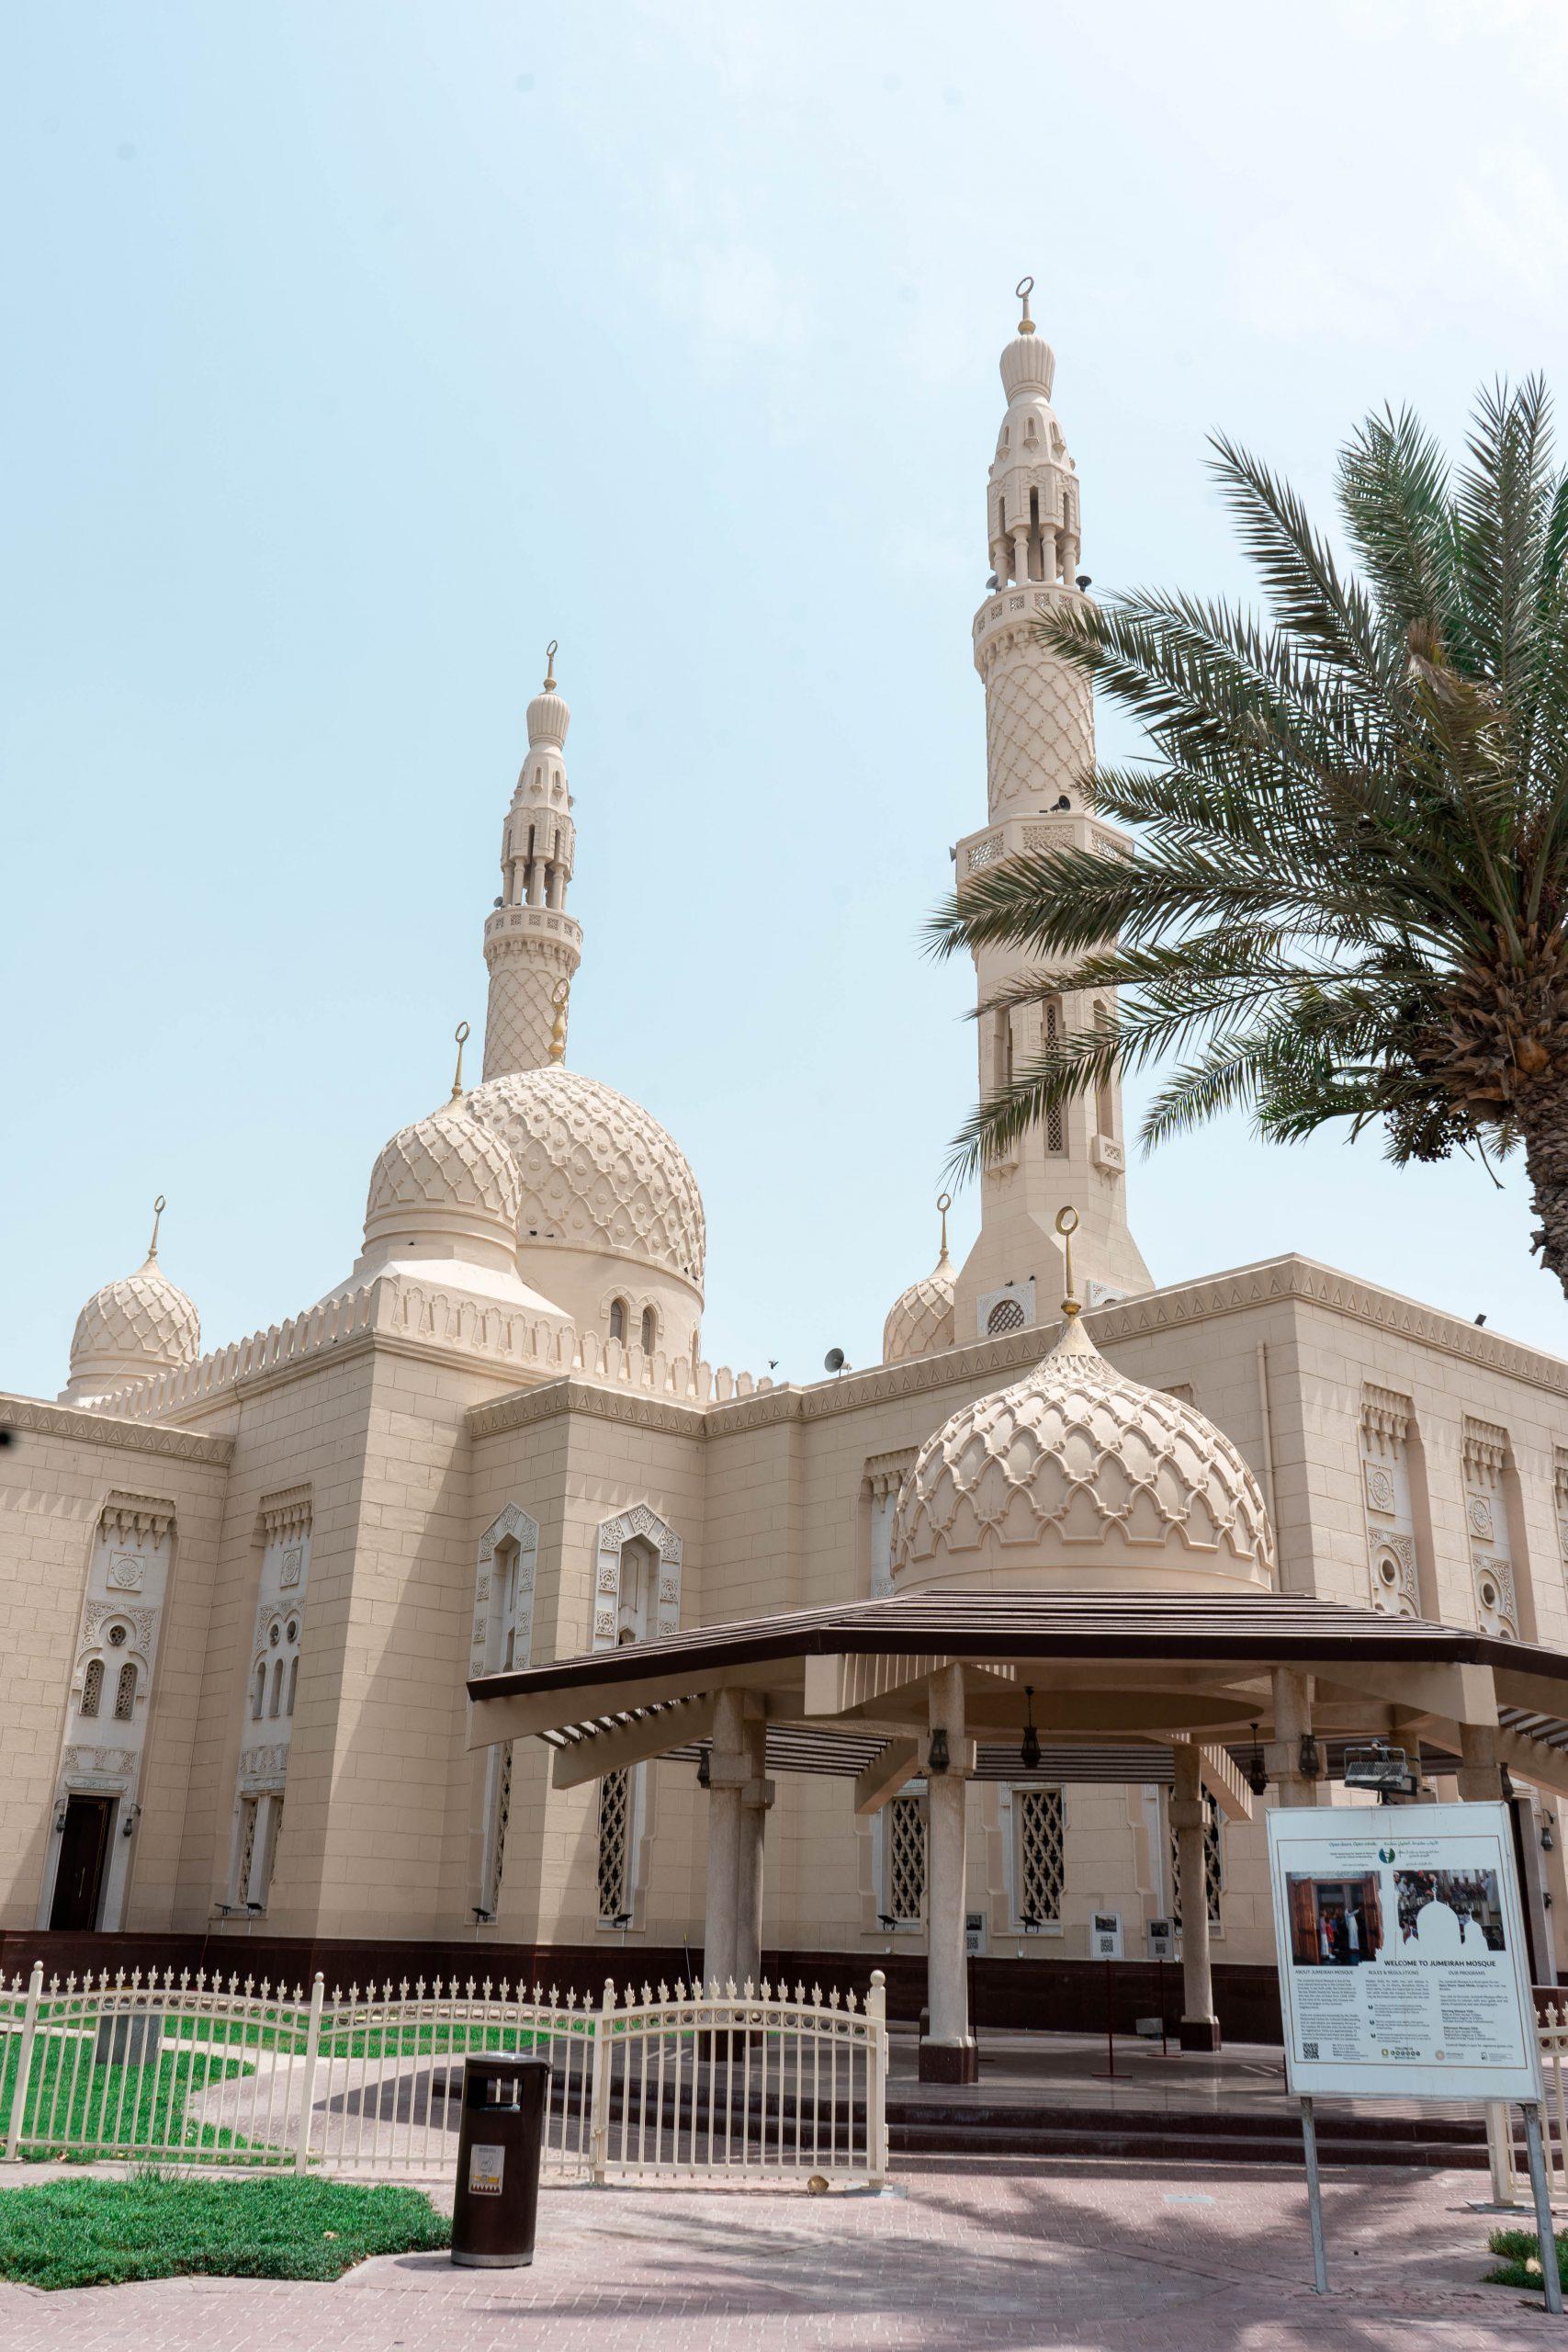 jumeirah mosque fatimid architecture dubai uae united arab emirates masjid pearl jumeirah